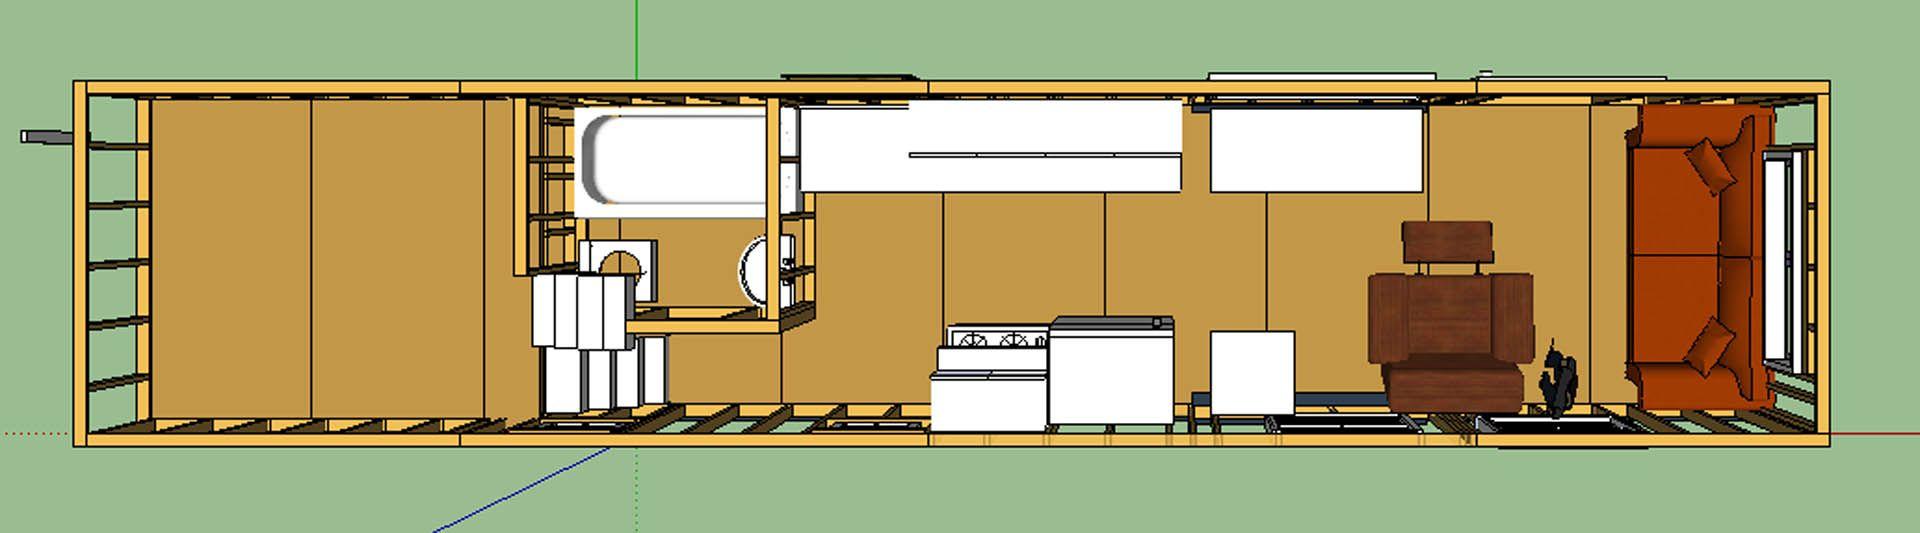 1000 images about Tiny House Gooseneck on Pinterest Gooseneck